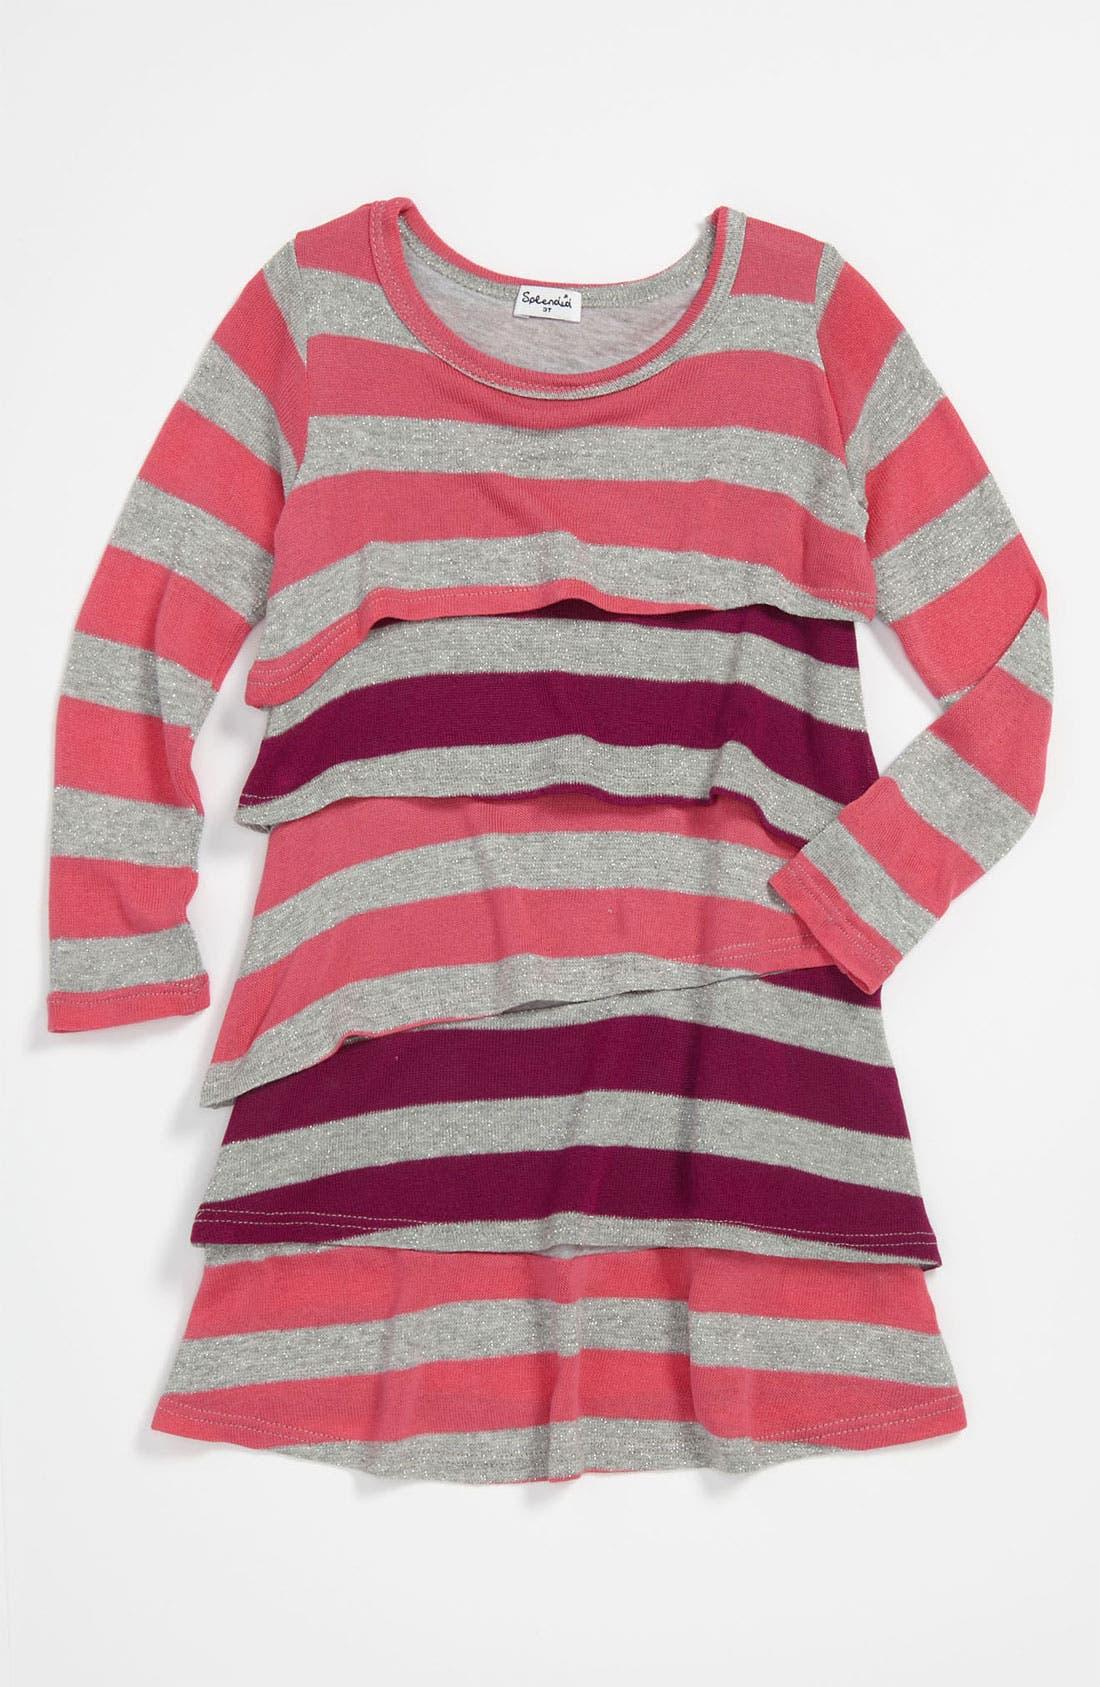 Alternate Image 1 Selected - Splendid 'Platinum' Stripe Dress (Toddler)